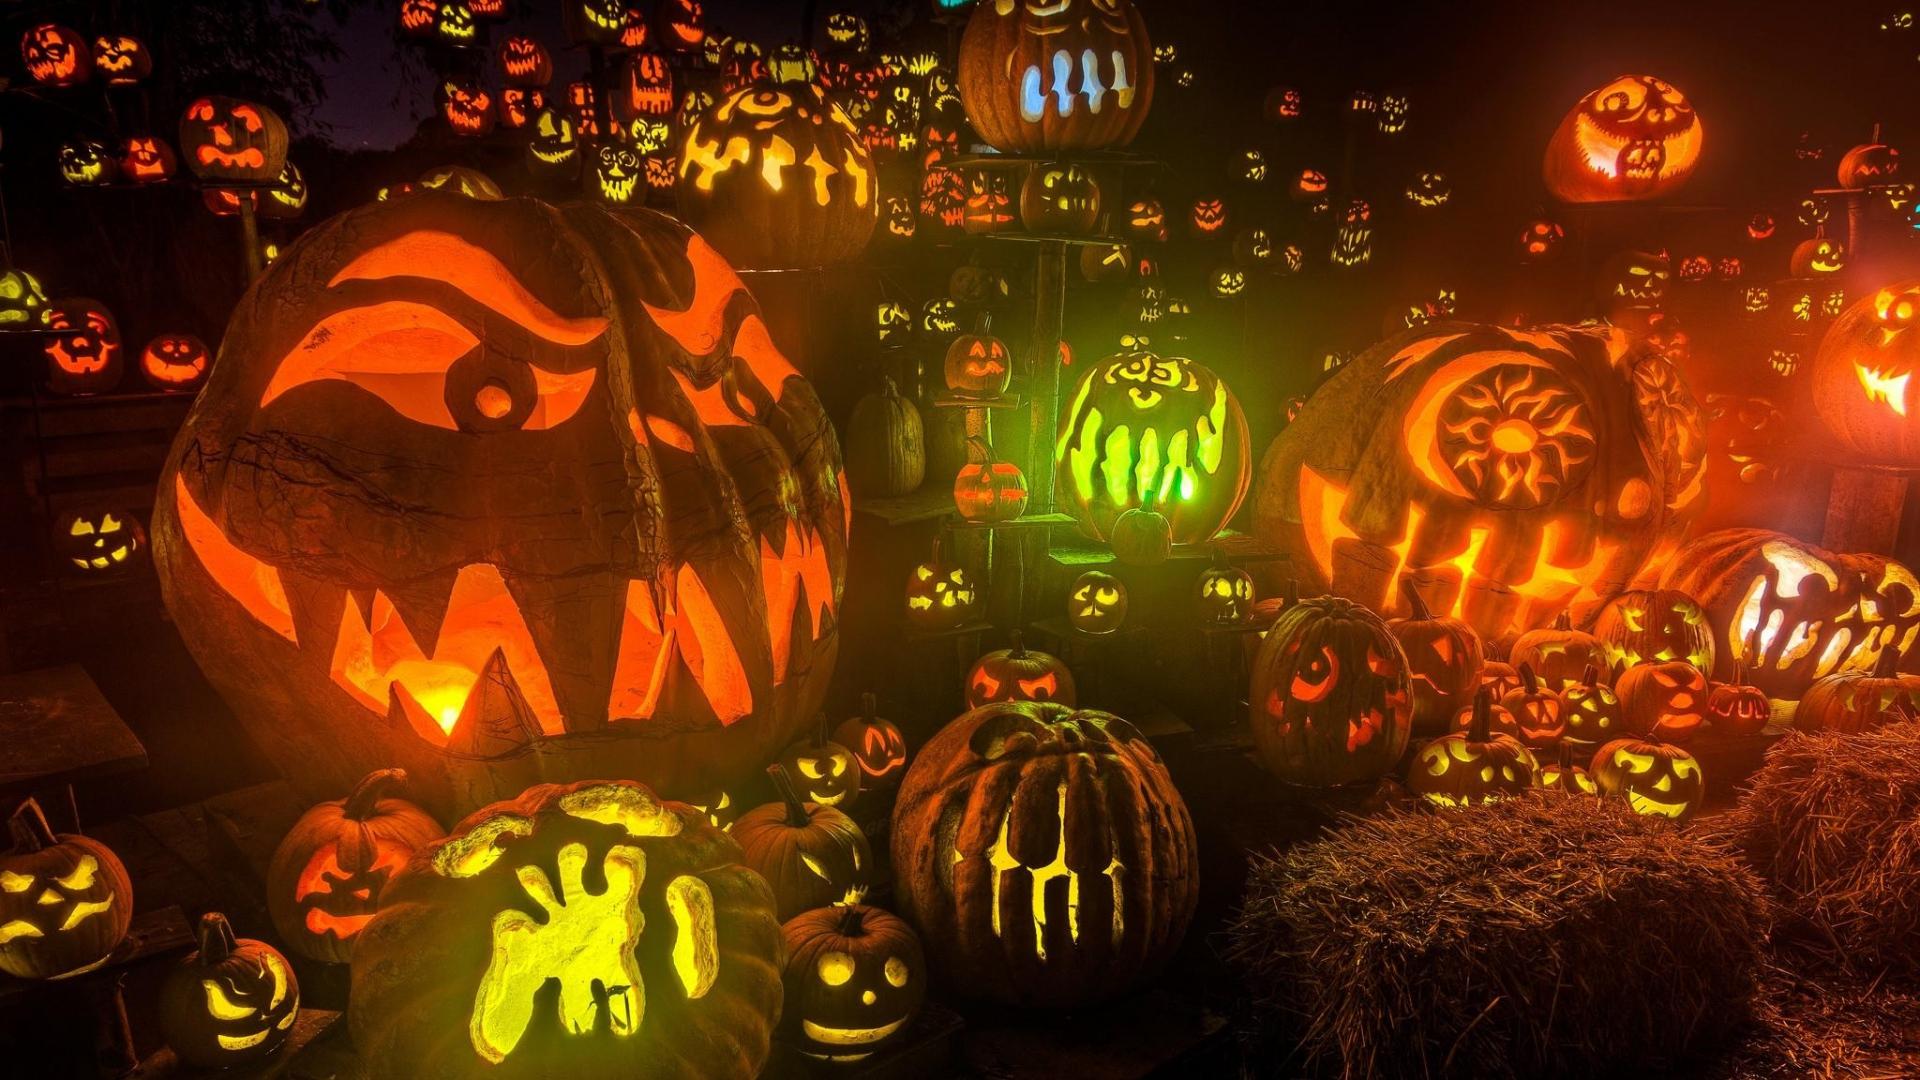 50 Halloween Hd Wallpapers 1080p On Wallpapersafari